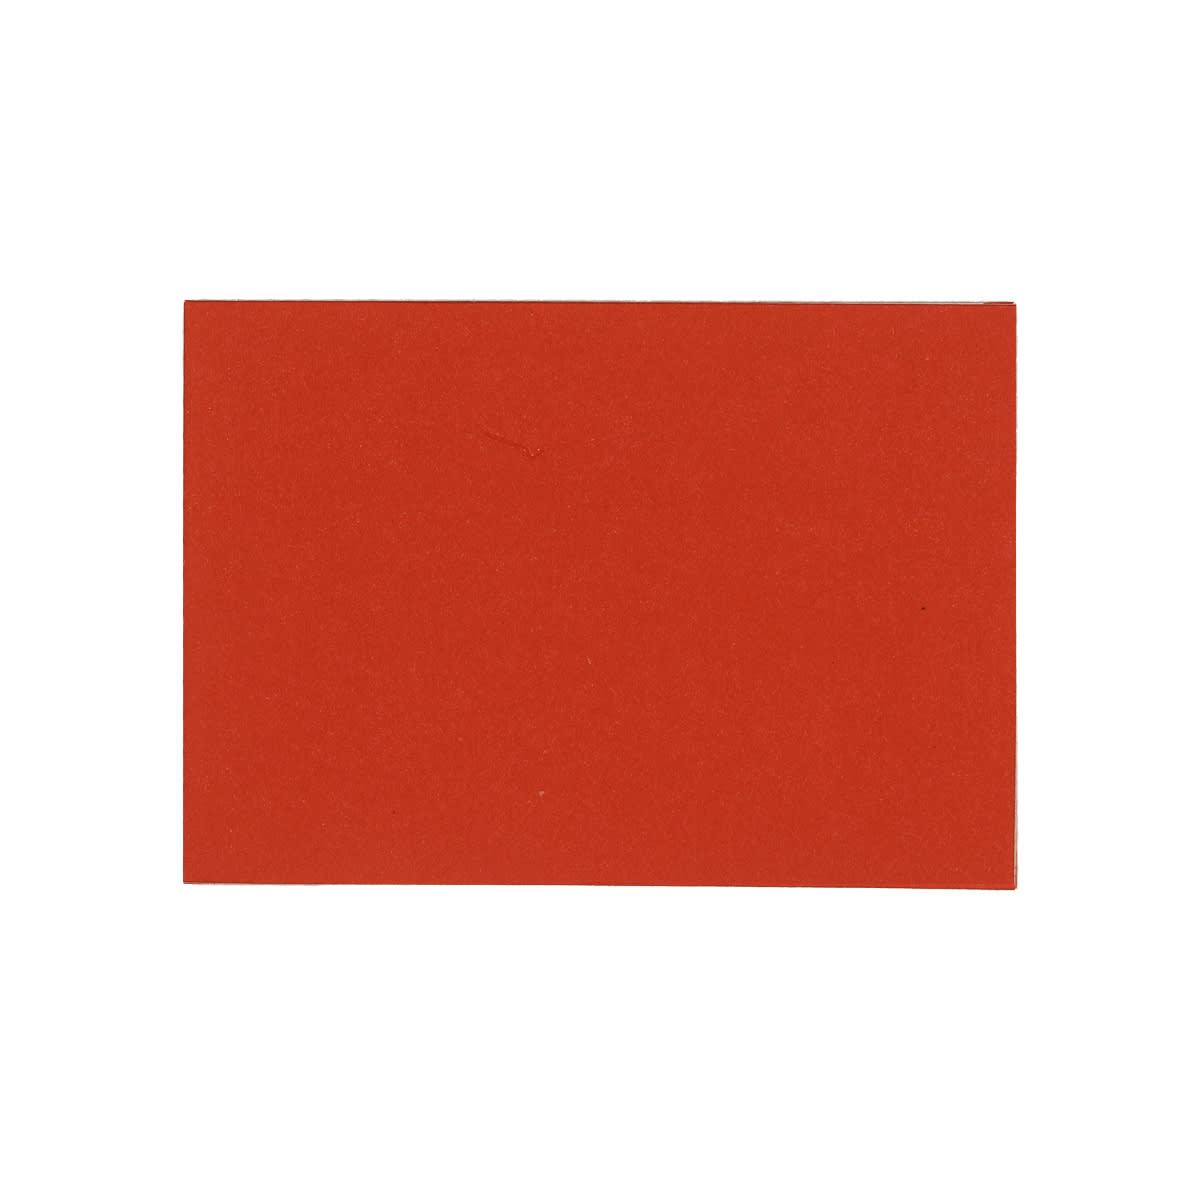 RED 70 x 100mm PEEL & SEAL ENVELOPES (i2)